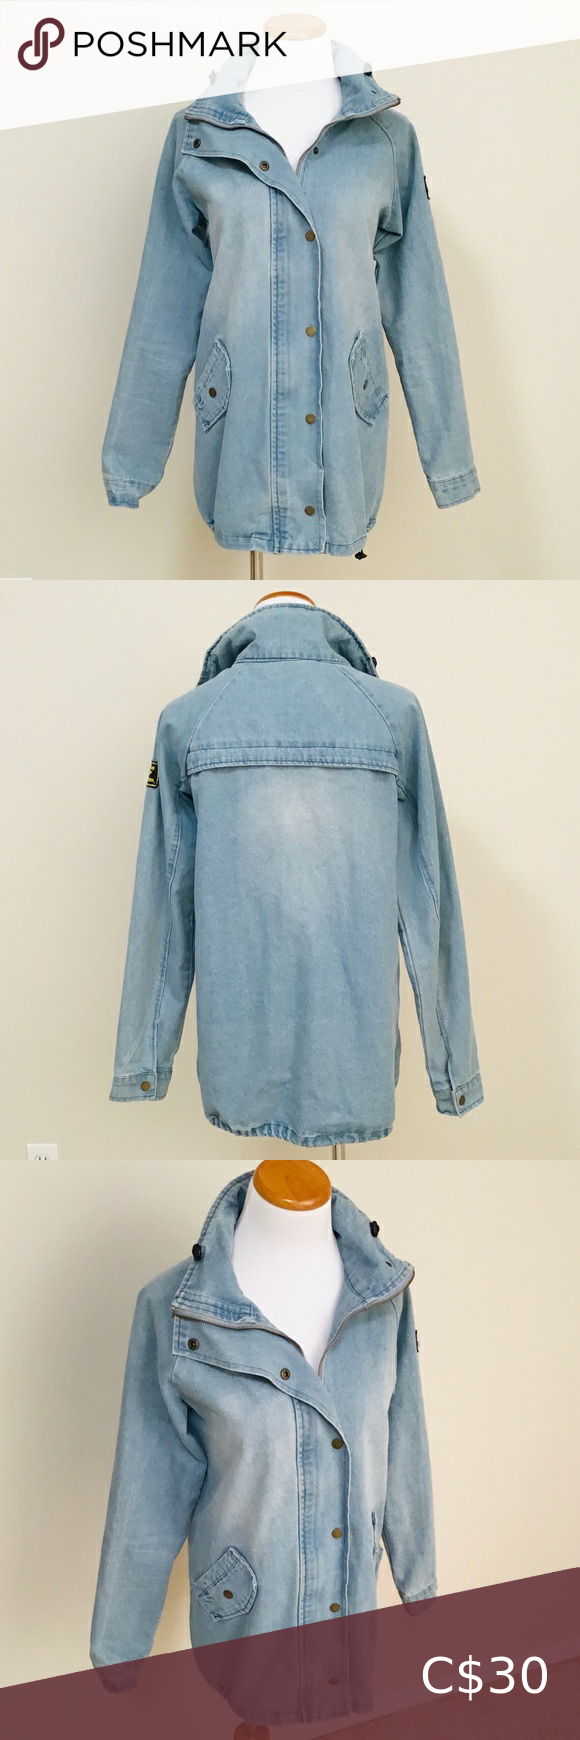 ZAFUL Light Wash Boyfriend Fit Denim Jacket#boyfriend #denim #fit #jacket #light #wash #zaful